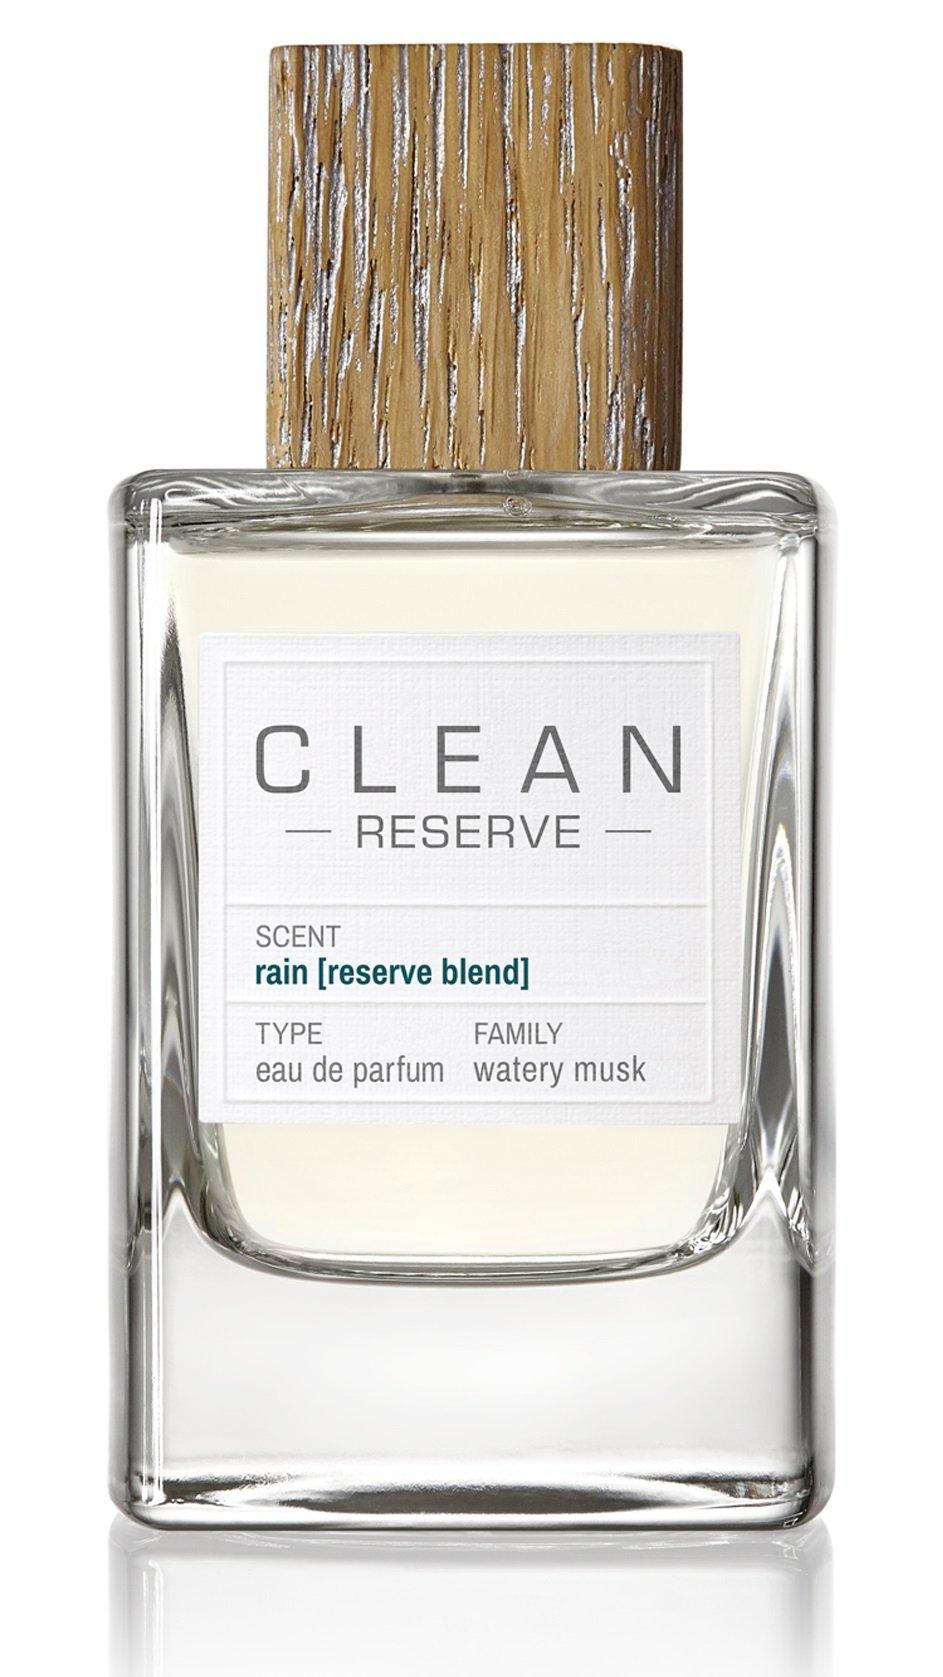 Clean Reserve - Reserve Blend Rain EDP 100 ml